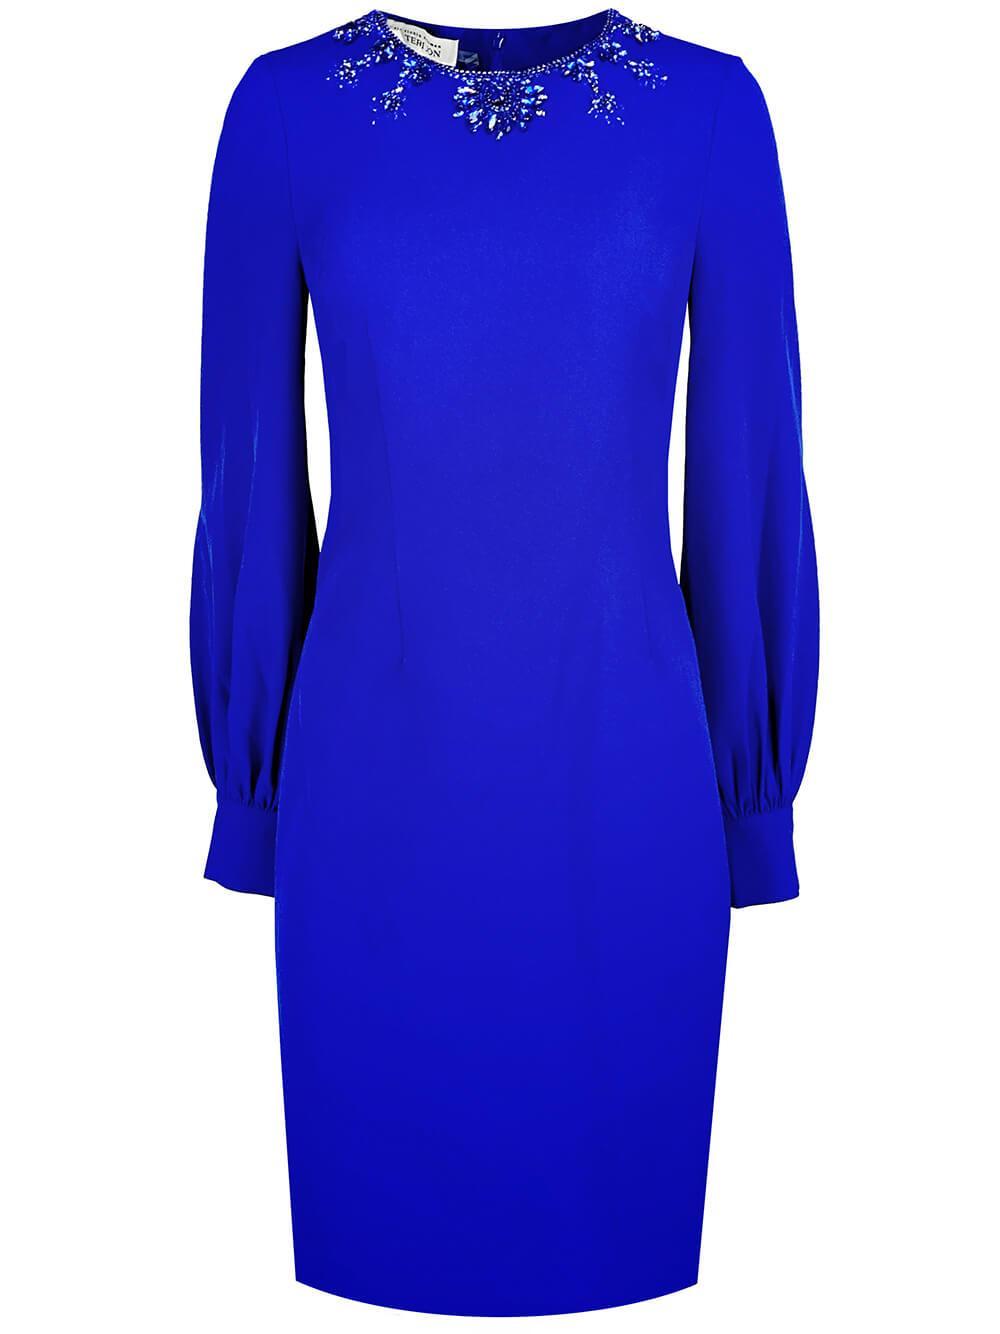 Jeweled Neckline Sheath Dress Item # 217209